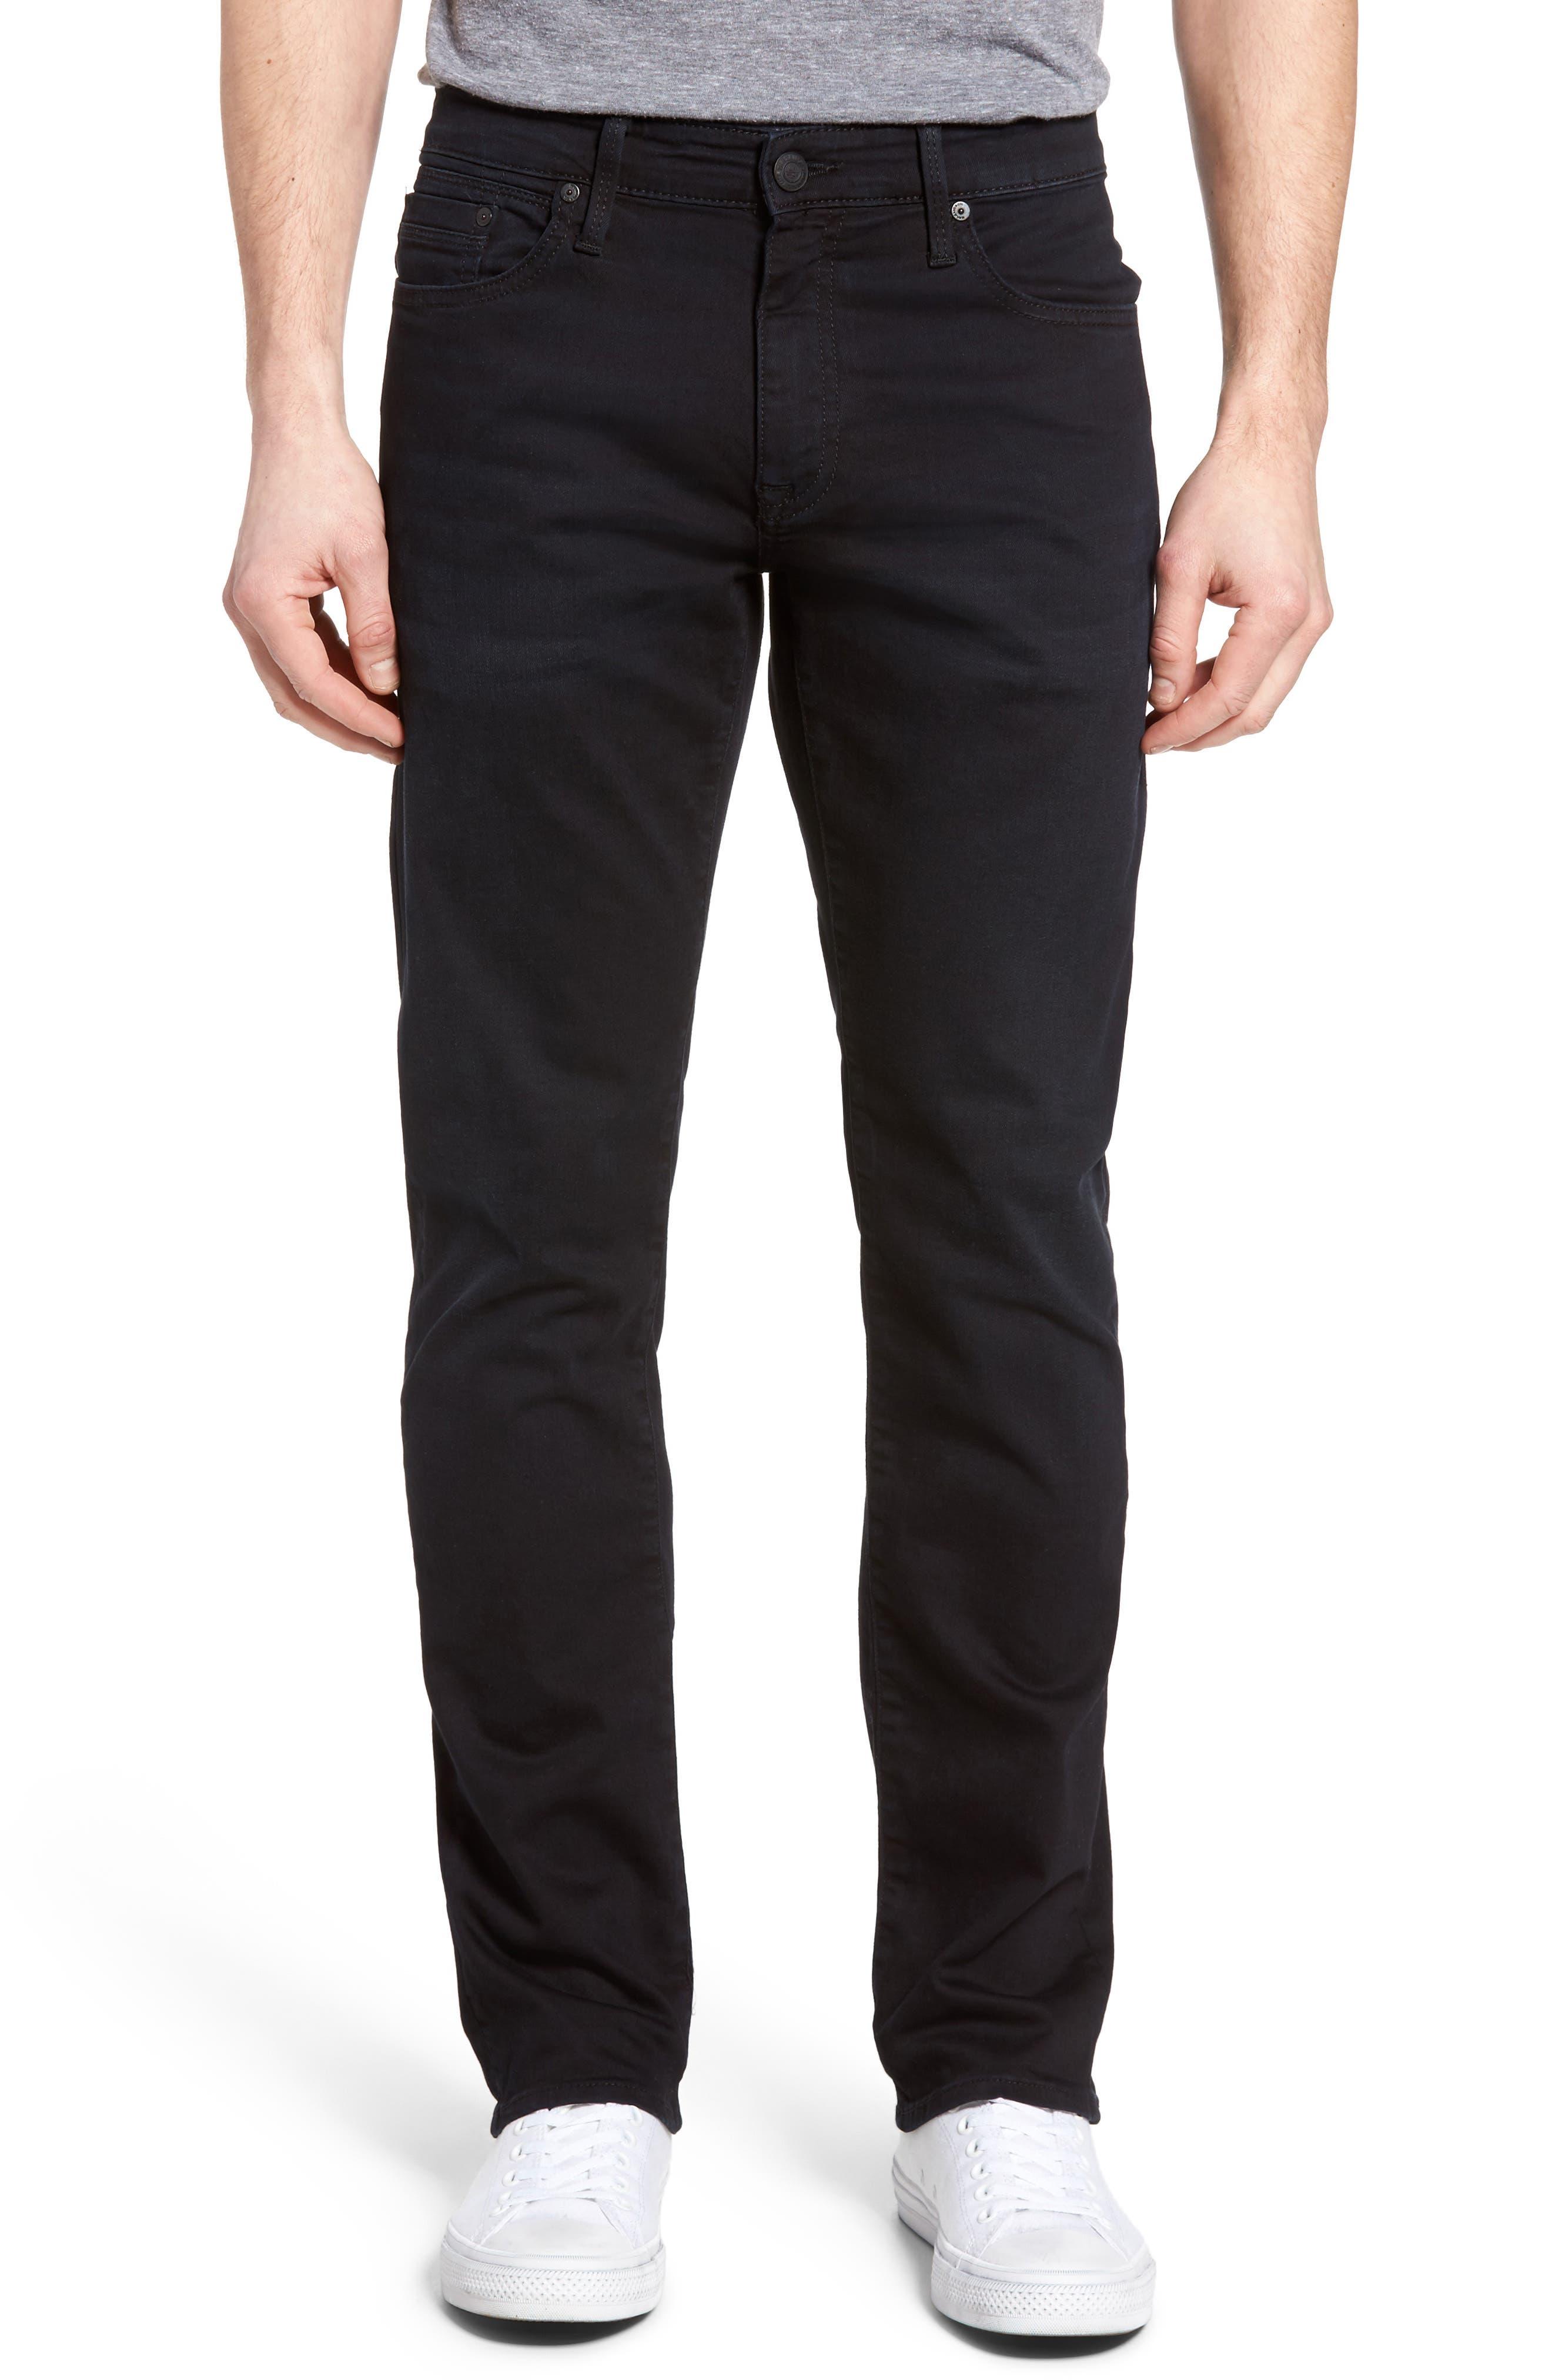 Zach Straight Leg Jeans,                             Main thumbnail 1, color,                             401